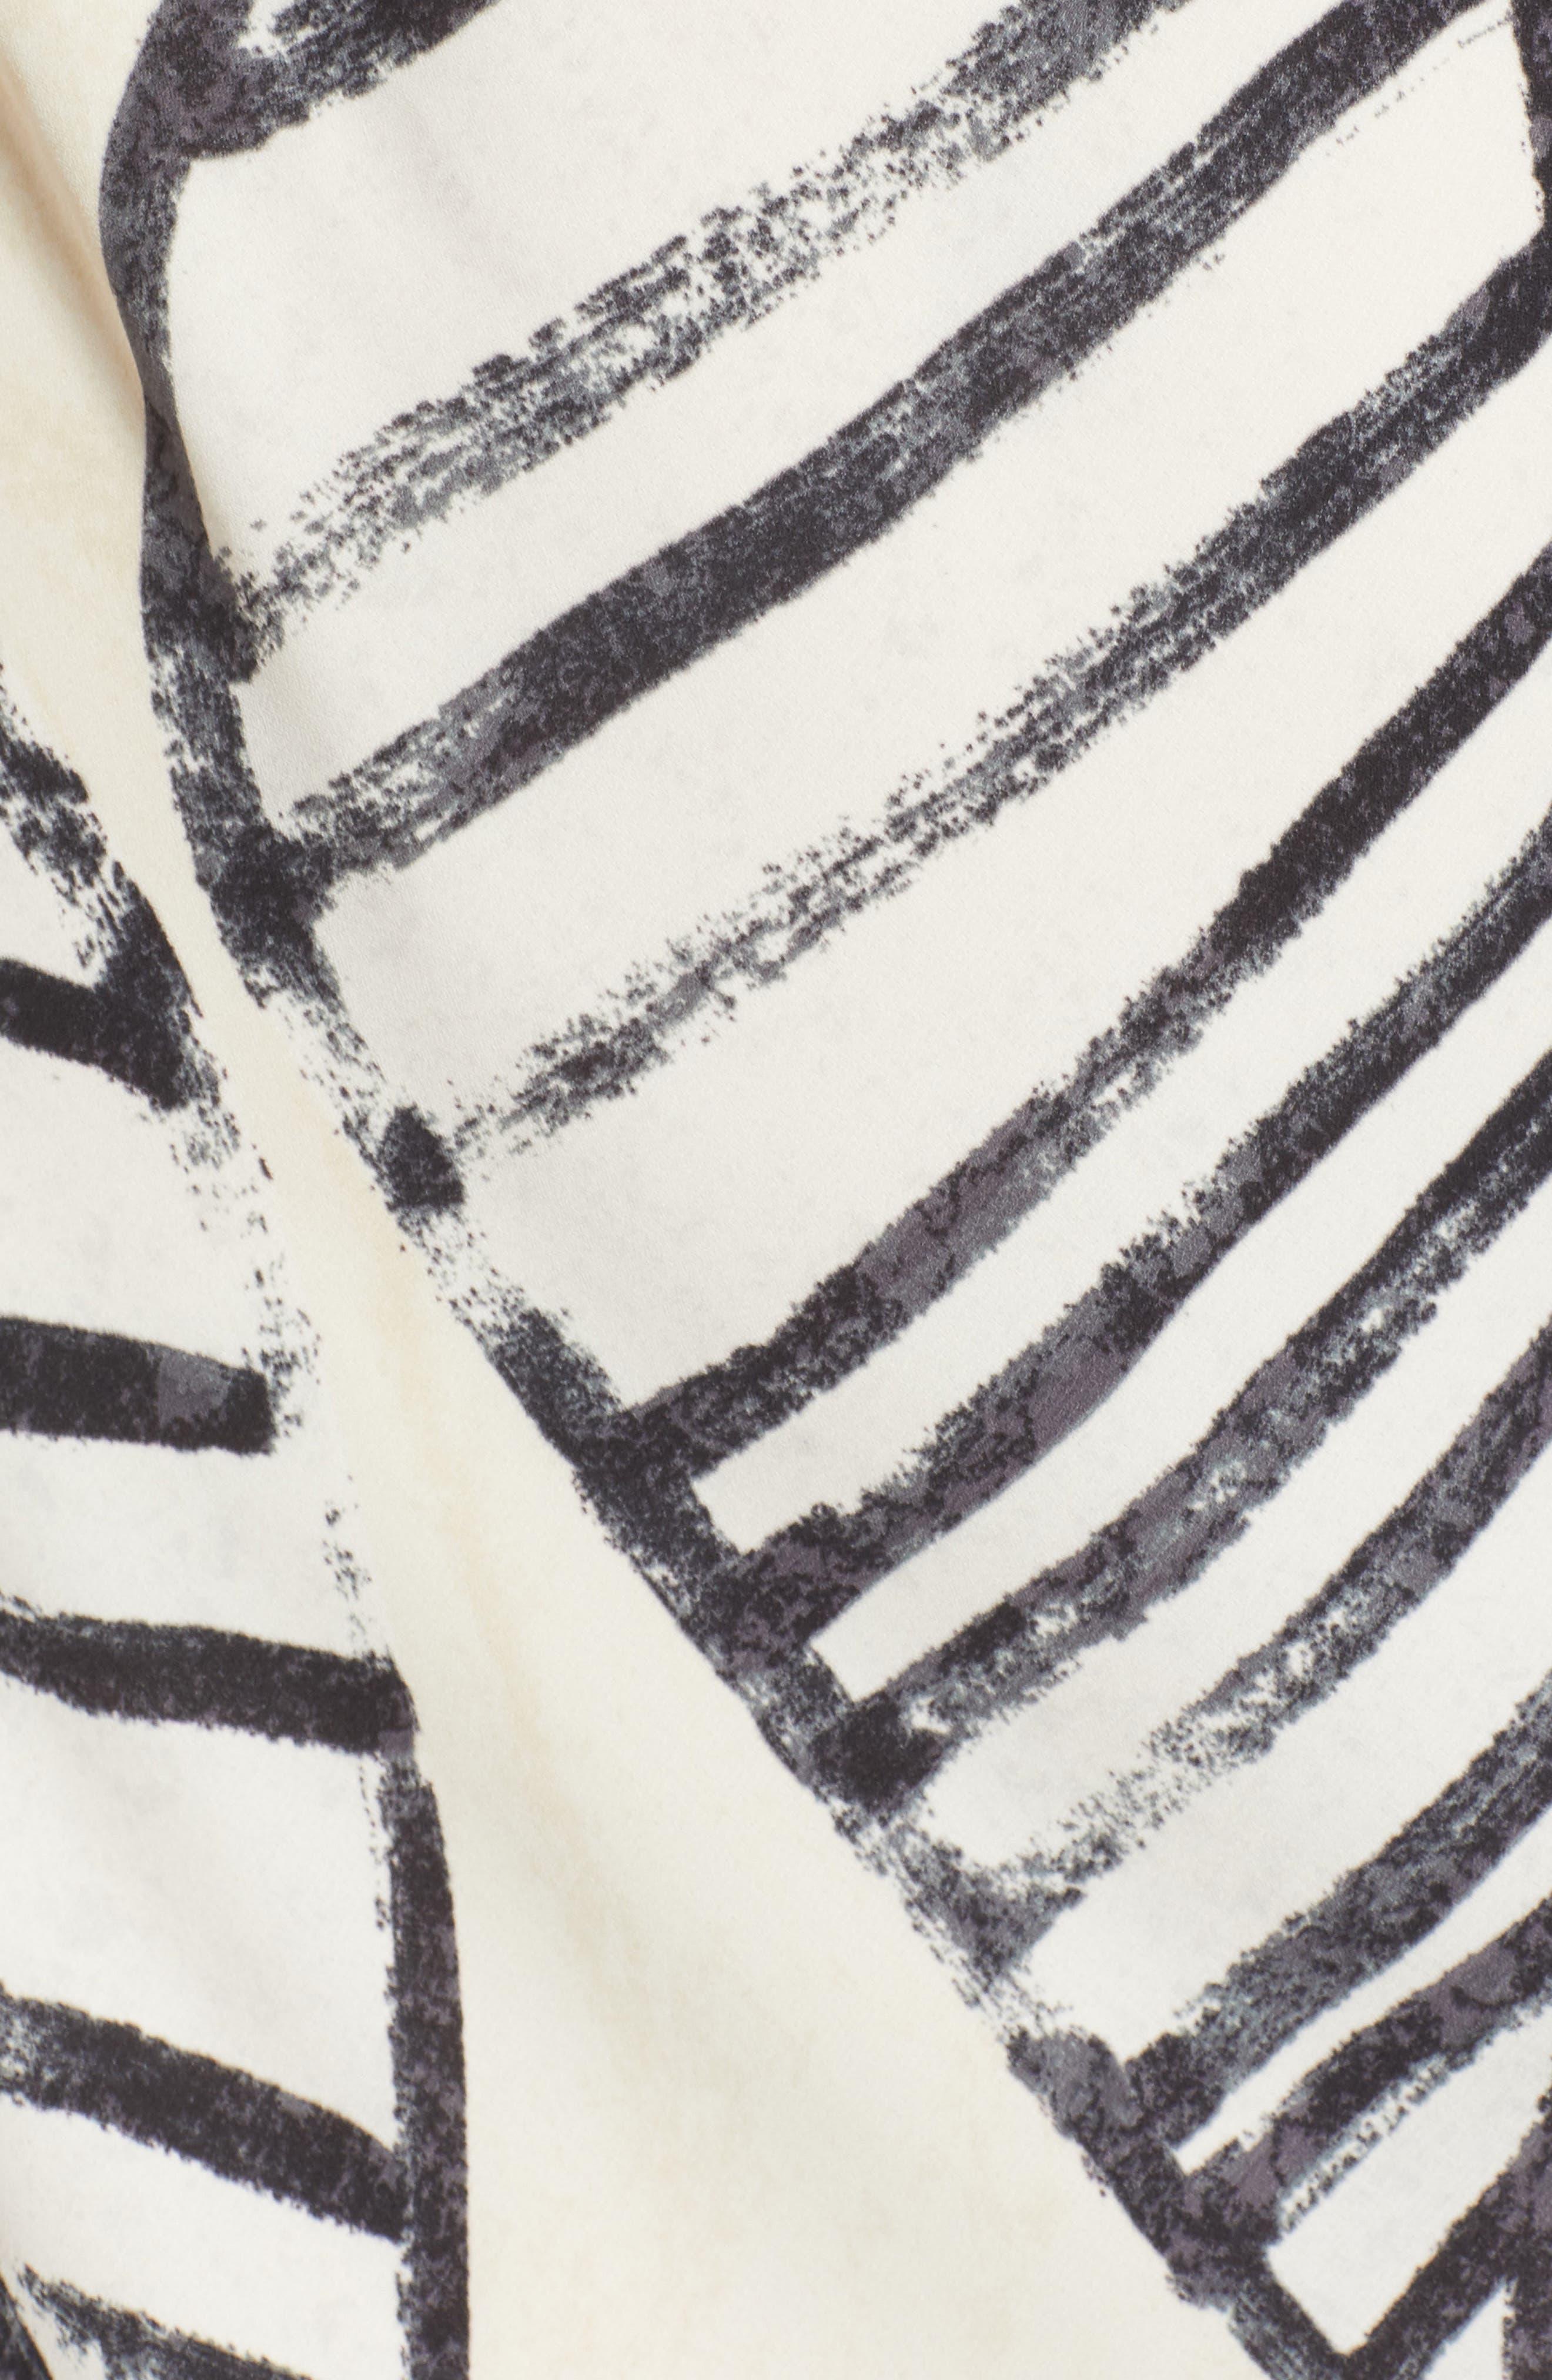 Etched Leaves Tie Dress,                             Alternate thumbnail 6, color,                             Multi